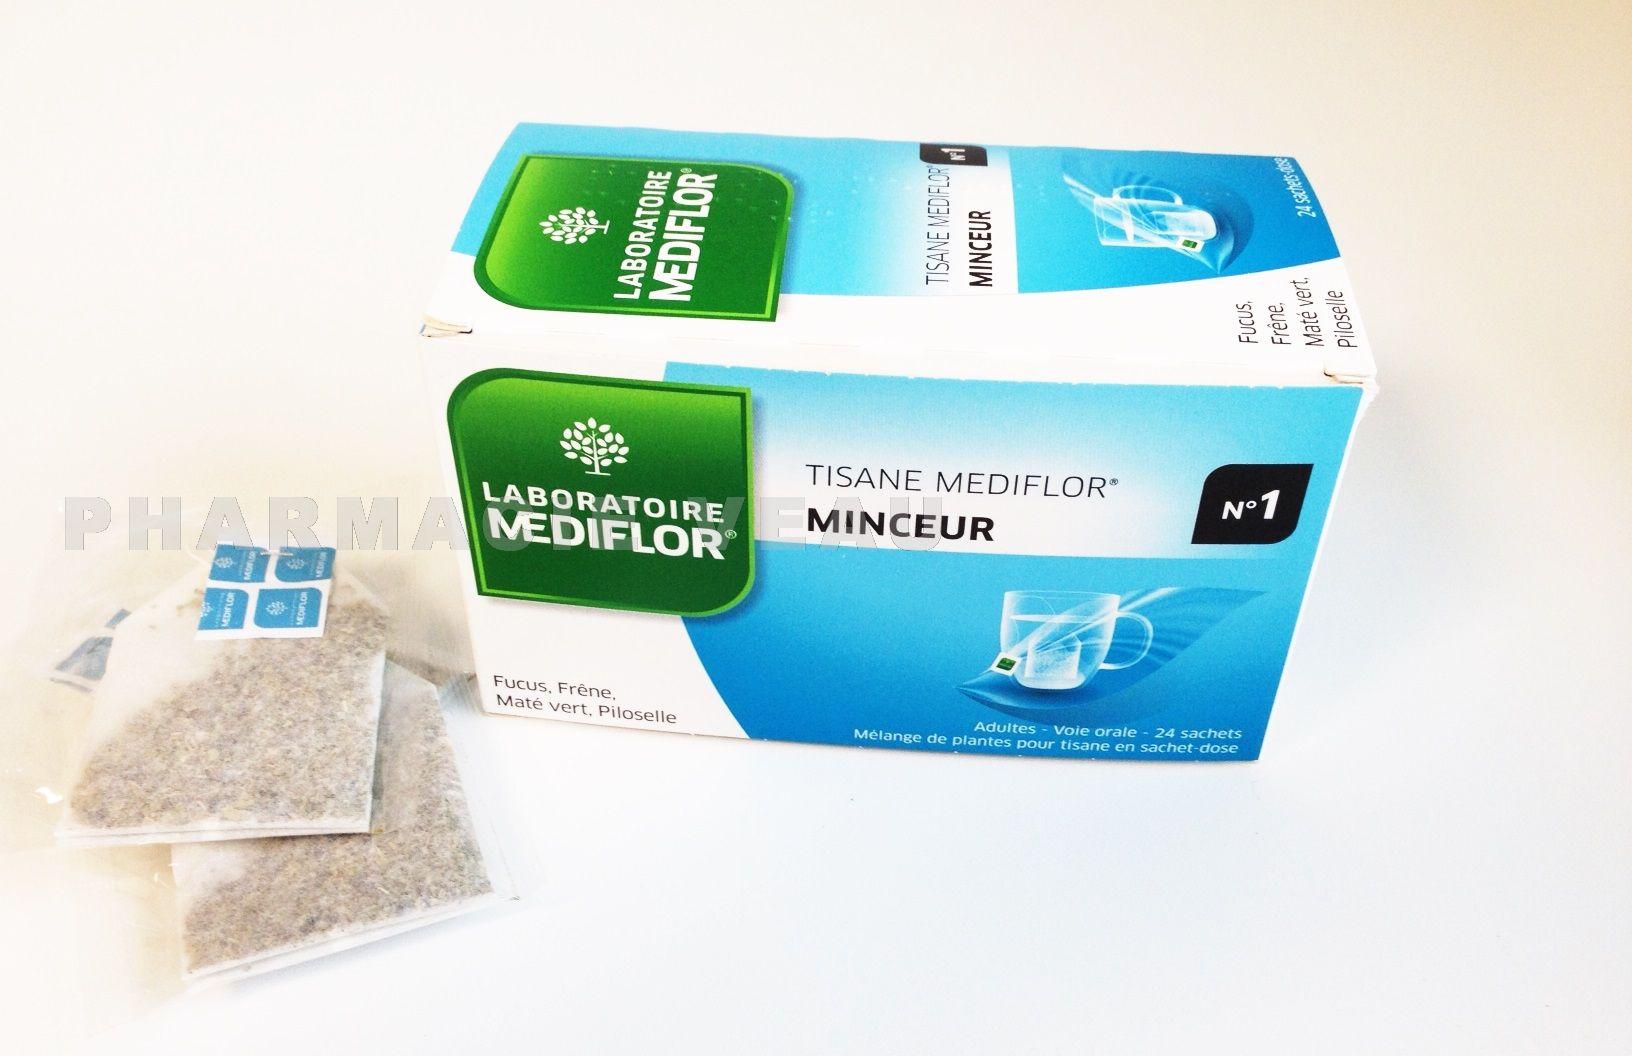 mediflor tisanes th rapeutiques n 1 minceur 24 sachets pharmacieveau. Black Bedroom Furniture Sets. Home Design Ideas